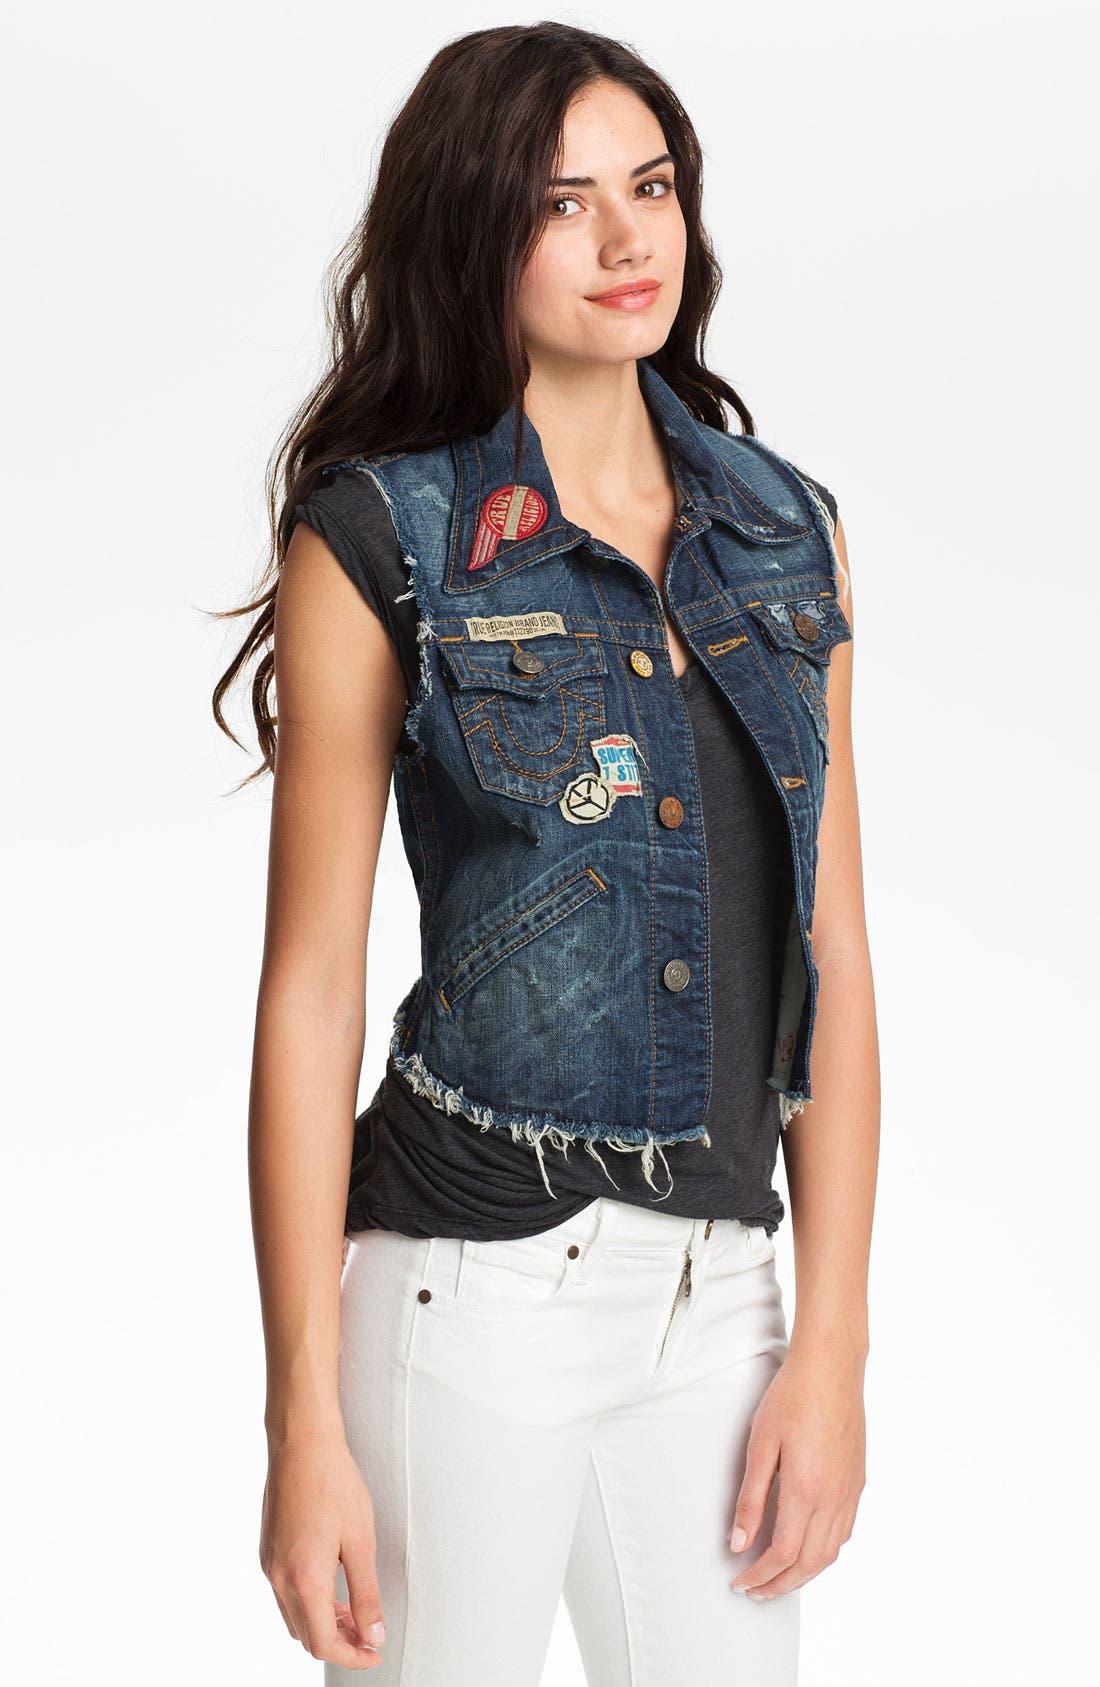 Alternate Image 1 Selected - True Religion Brand Jeans 'Jada' Cutoff Denim Vest